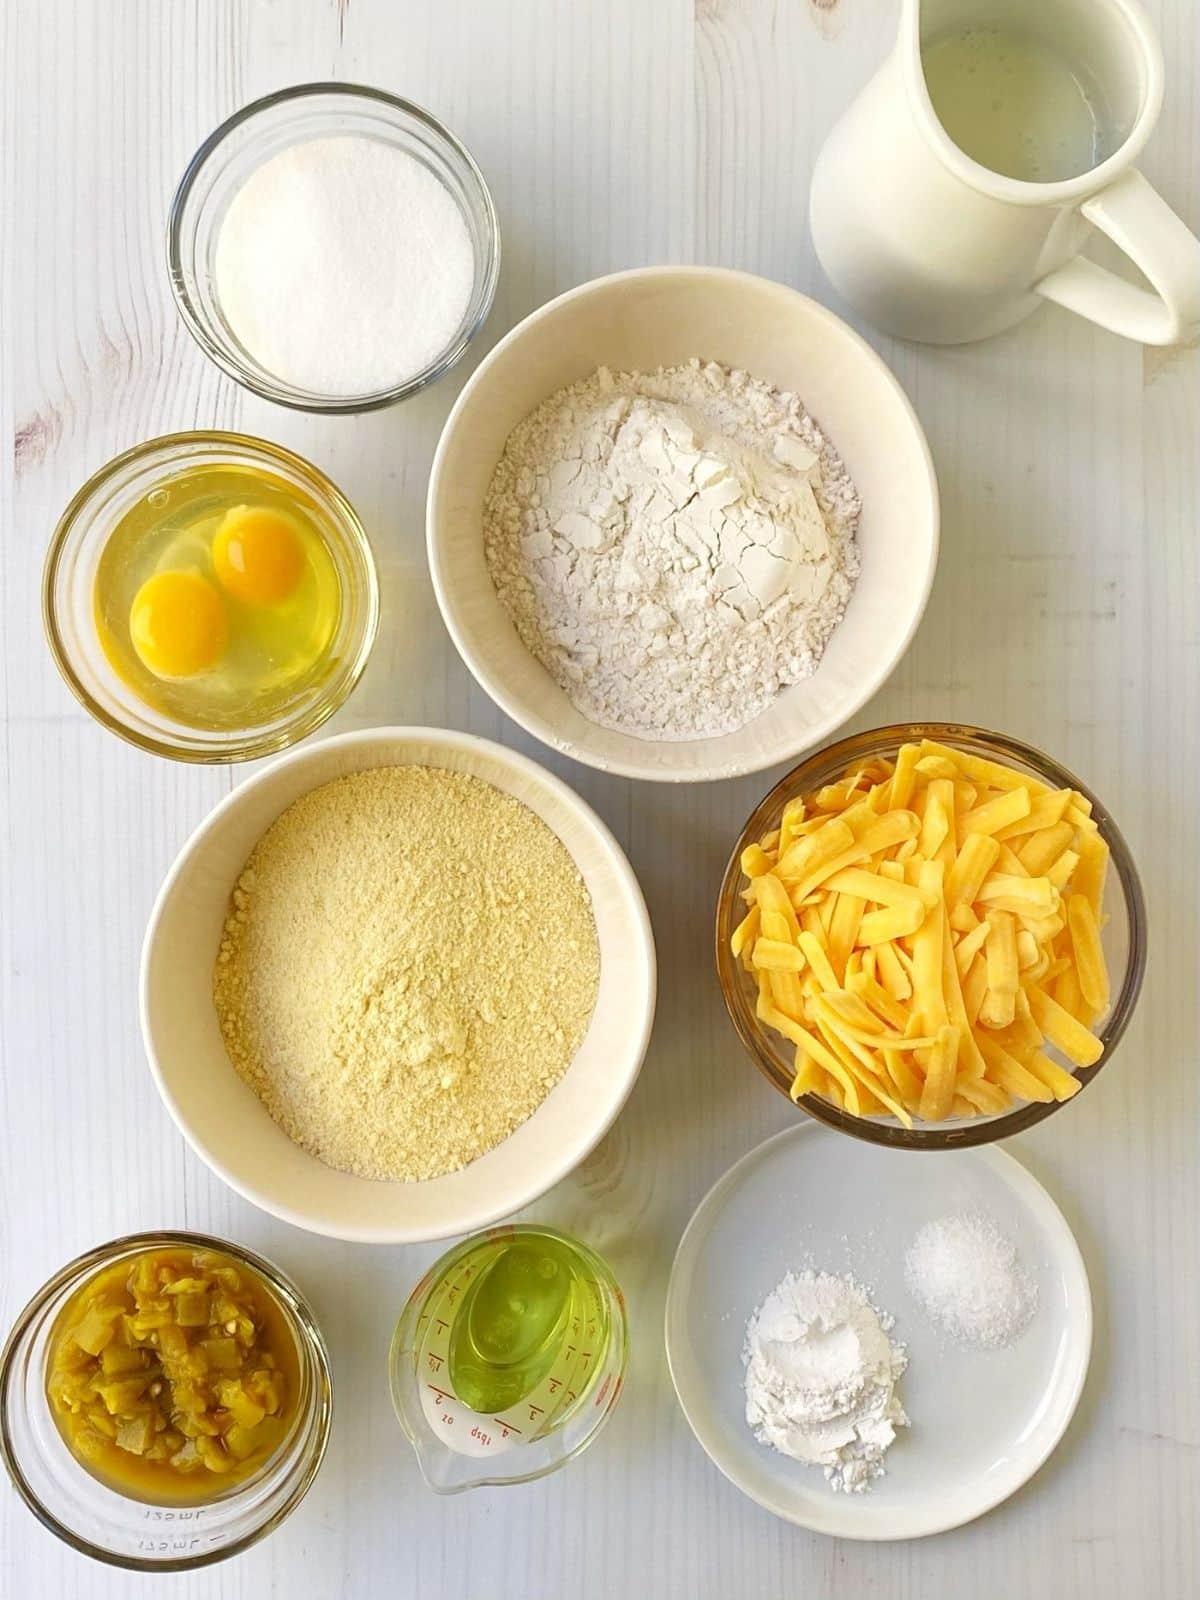 array of ingredients - flour, cornmeal, sugar, baking powder, salt, buttermilk, oil, eggs, cheese, chiles